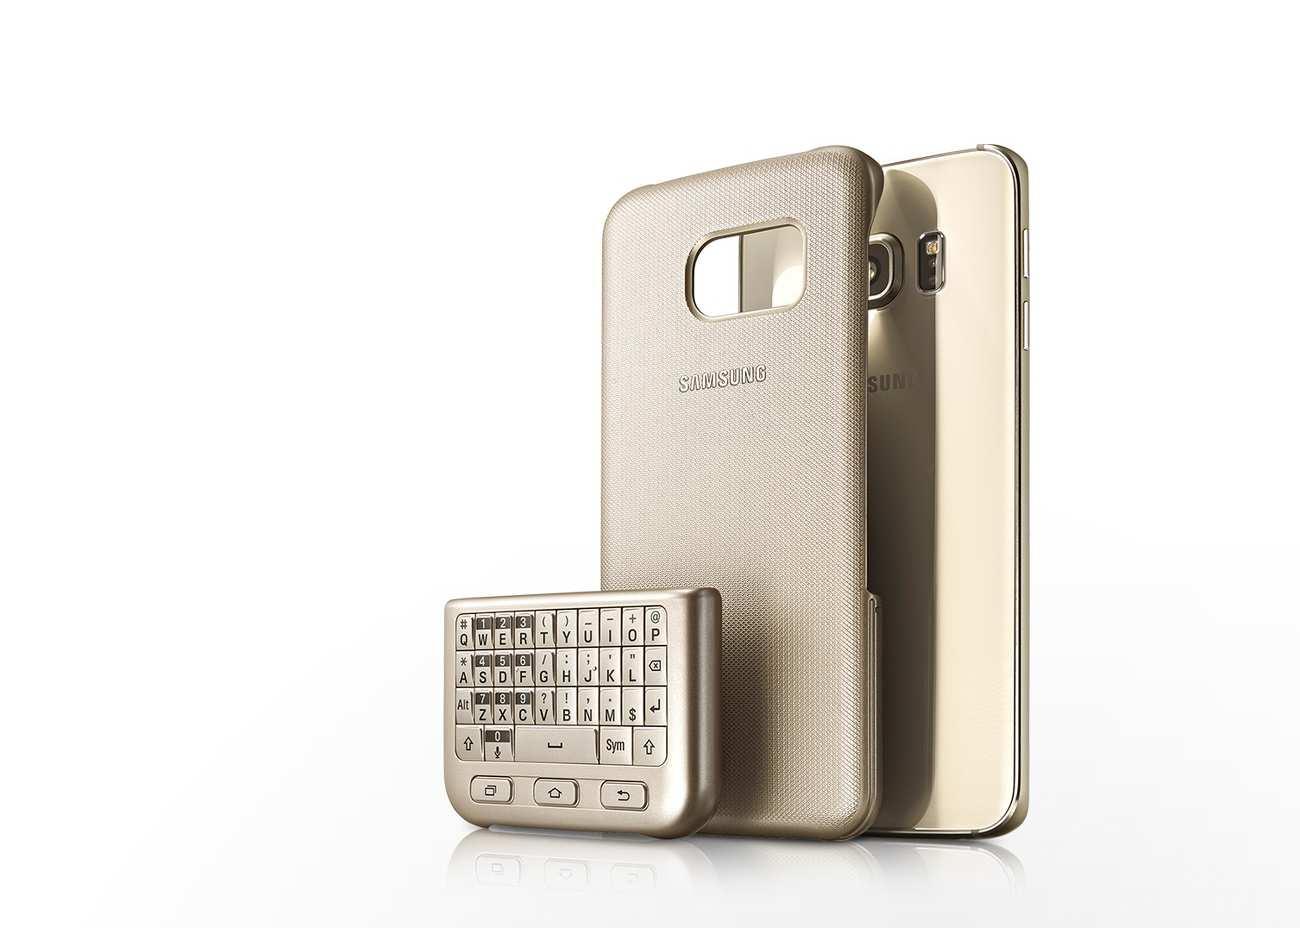 Galaxy Note 5 Keboard